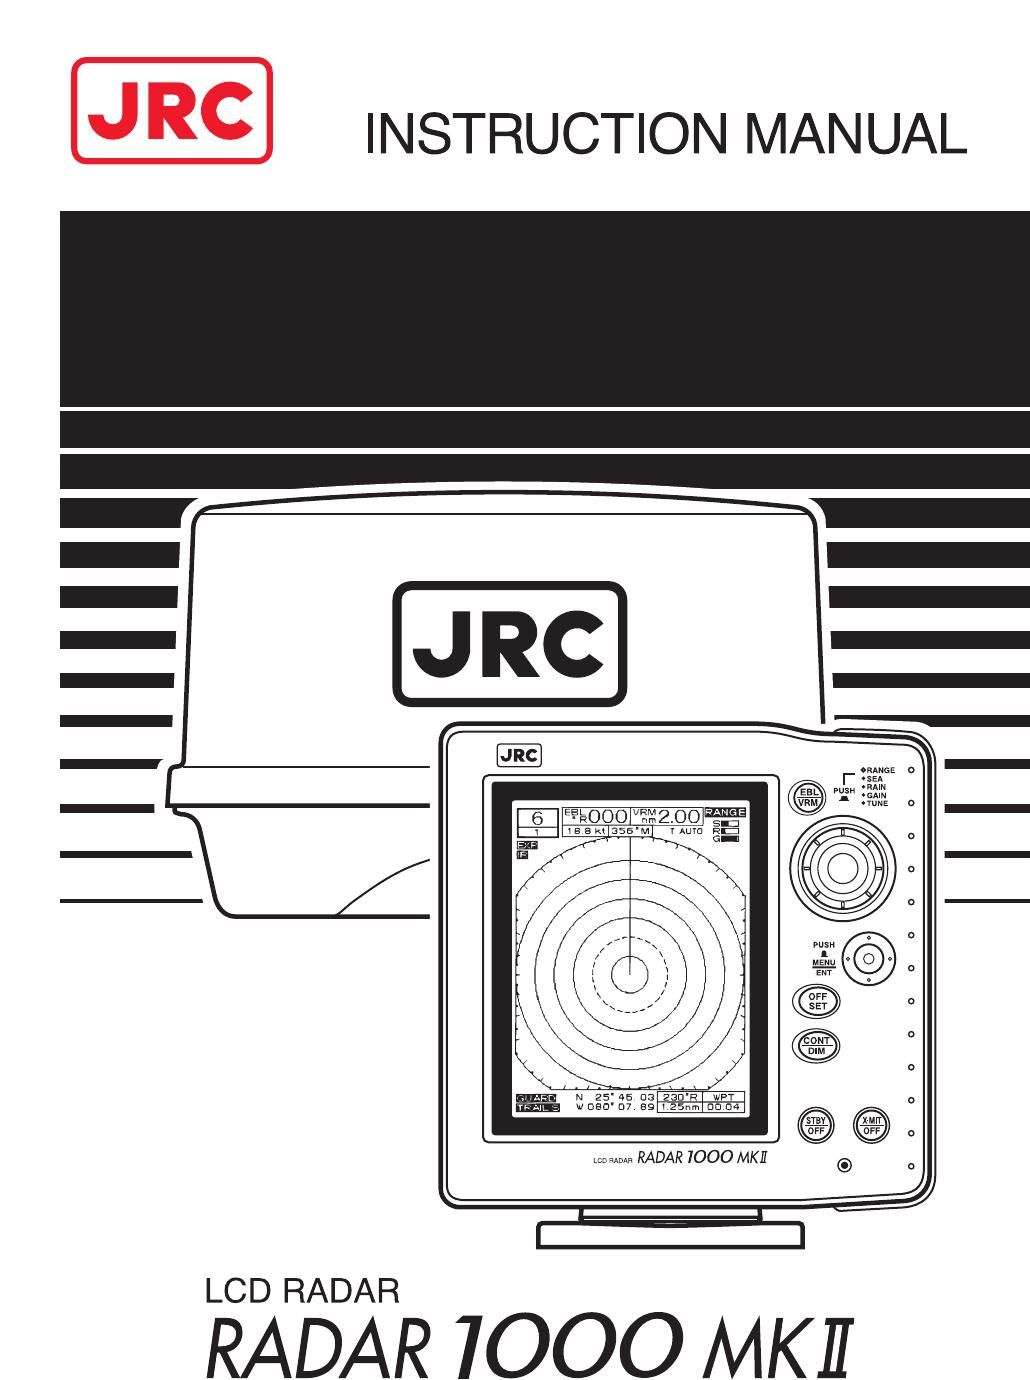 handleiding jrc radar1000 mkii pagina 1 van 49 english rh gebruikershandleiding com Radar Screen Chartplotter JRC Radar 1800